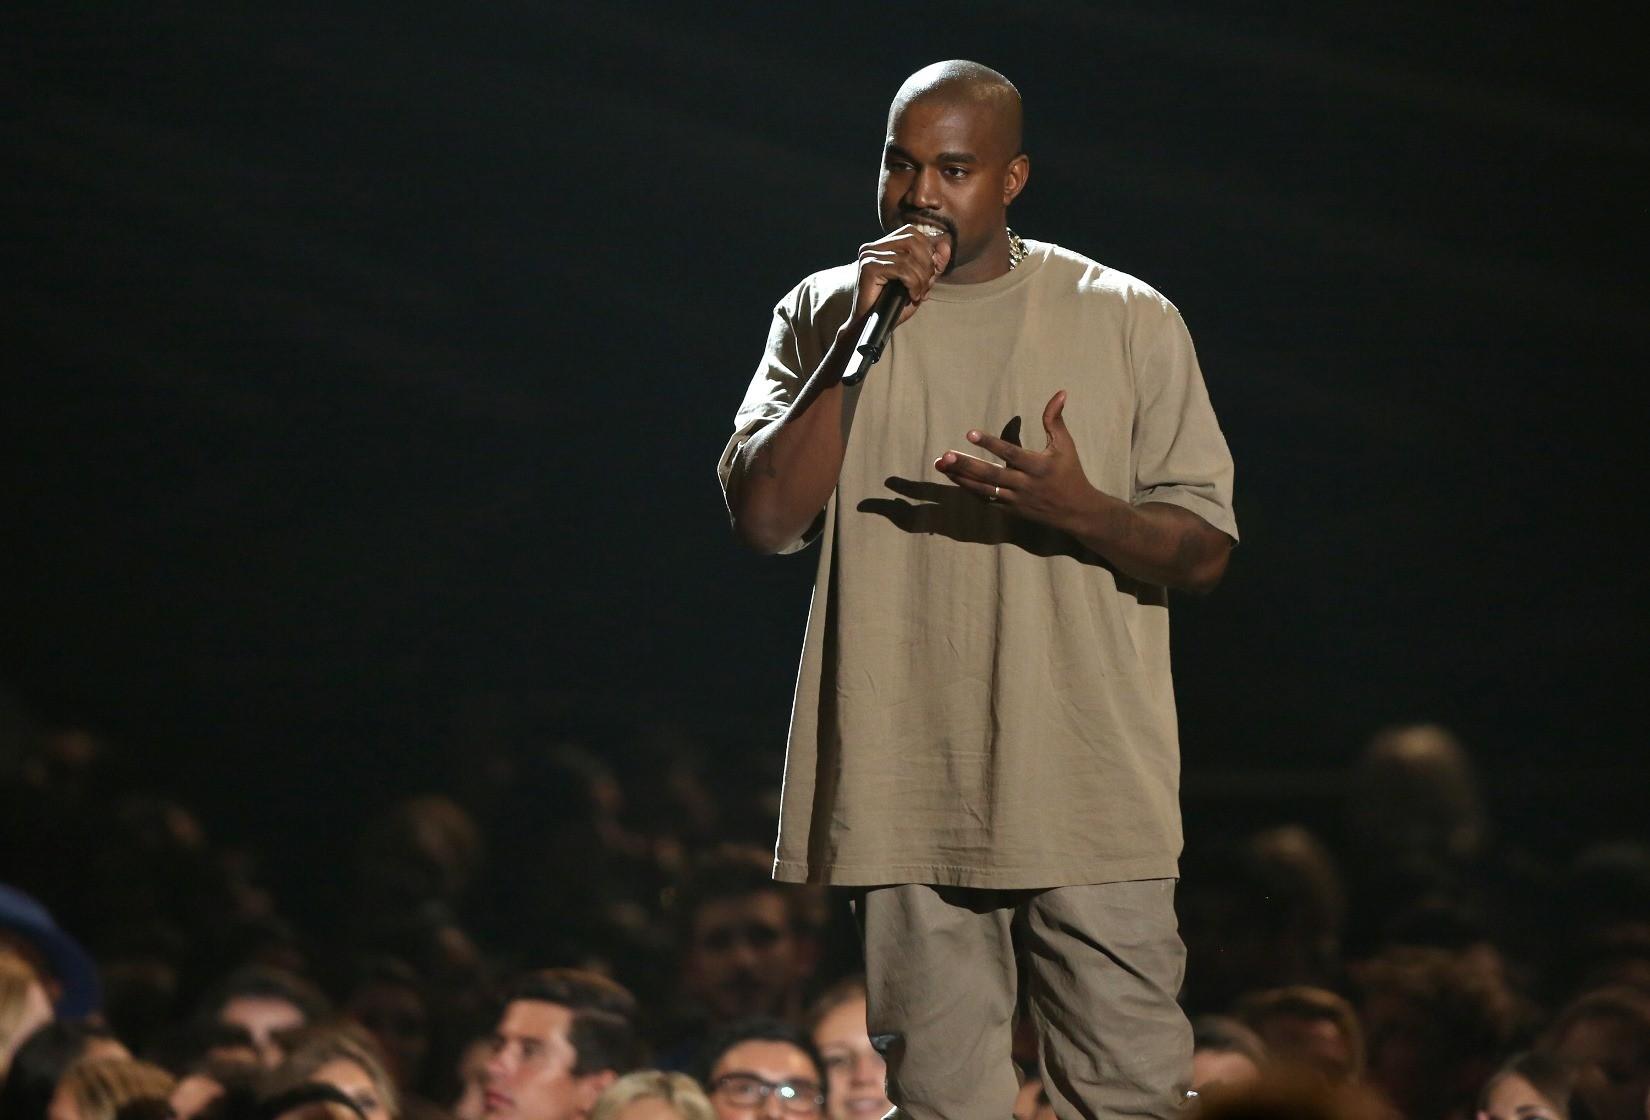 Kanye West lanou msica surpresa nesta sexta-feira (3) (Foto: AP)